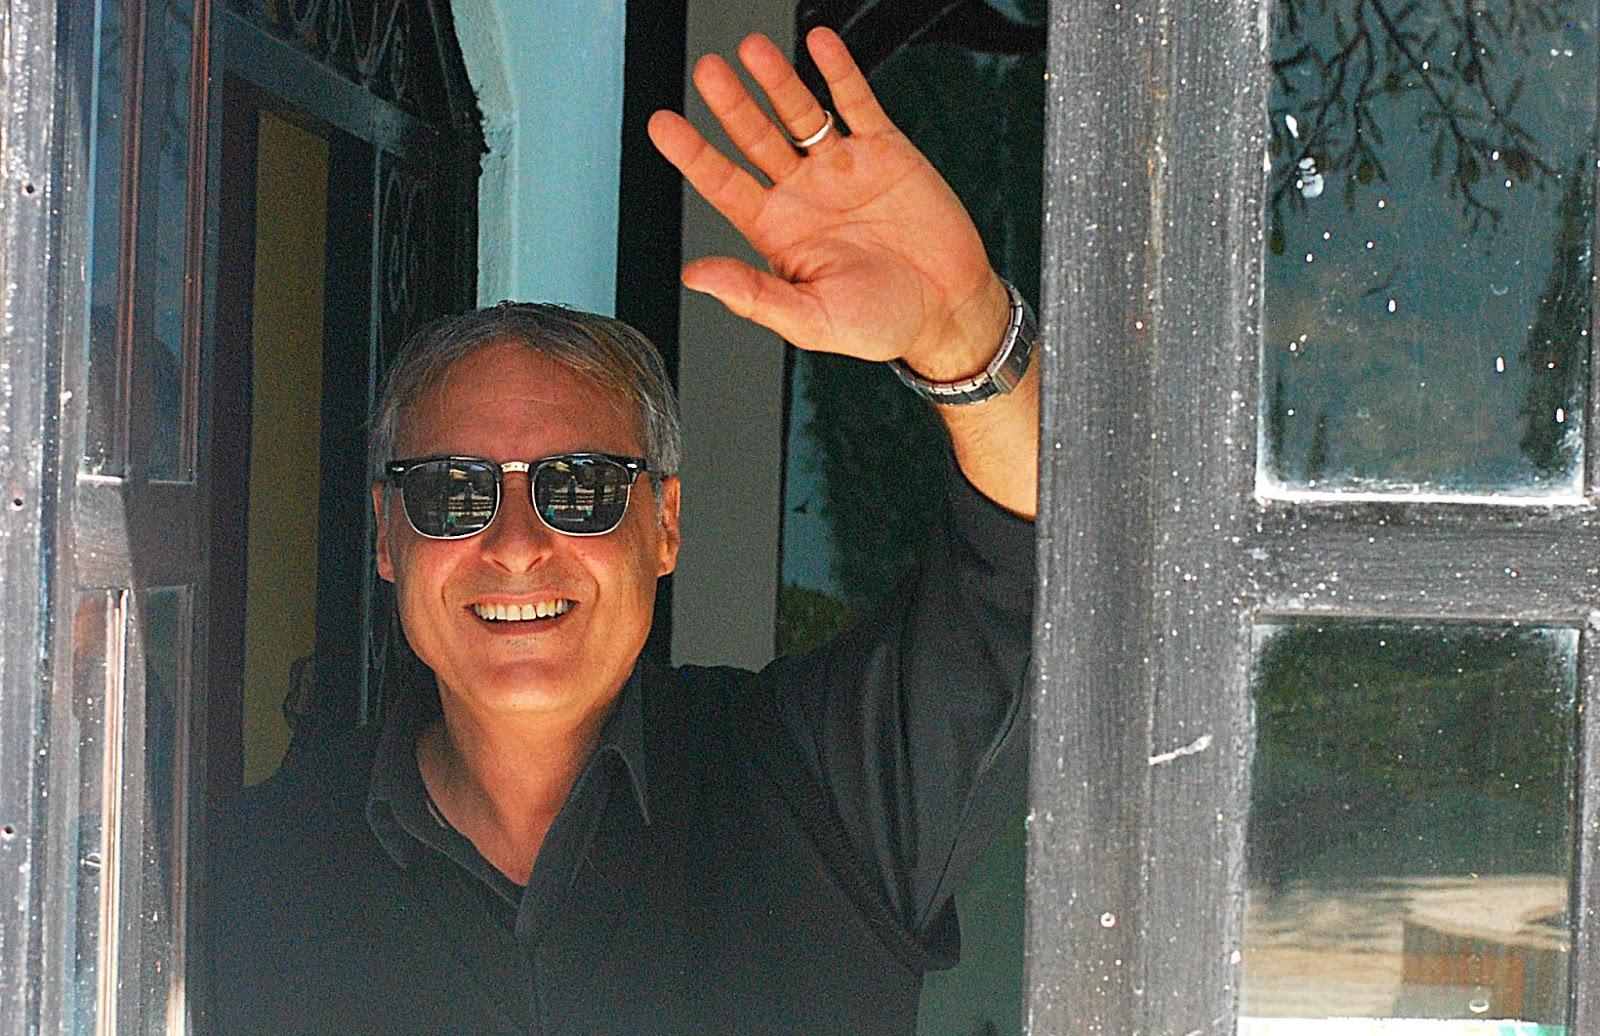 CupCakes and CrabLegs Five New Restaurant Openings in San Miguel de Allende